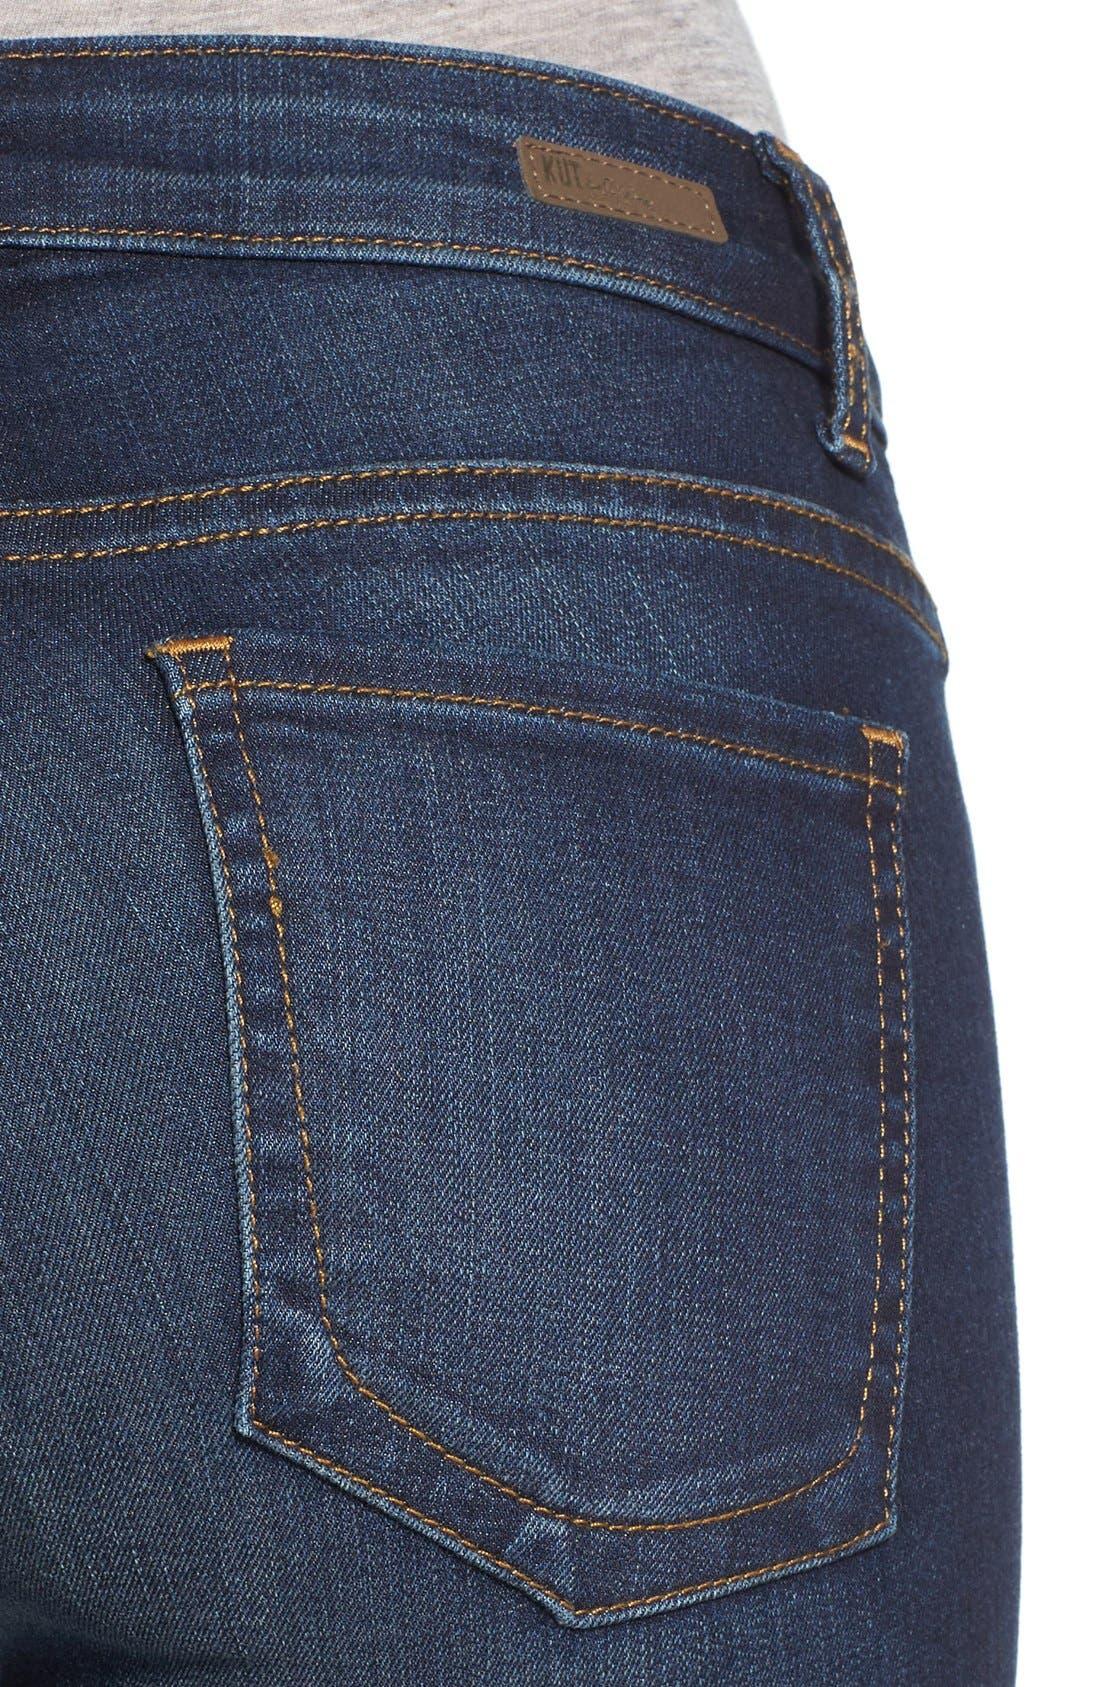 'Natalie' Stretch Bootleg Jeans,                             Alternate thumbnail 5, color,                             401